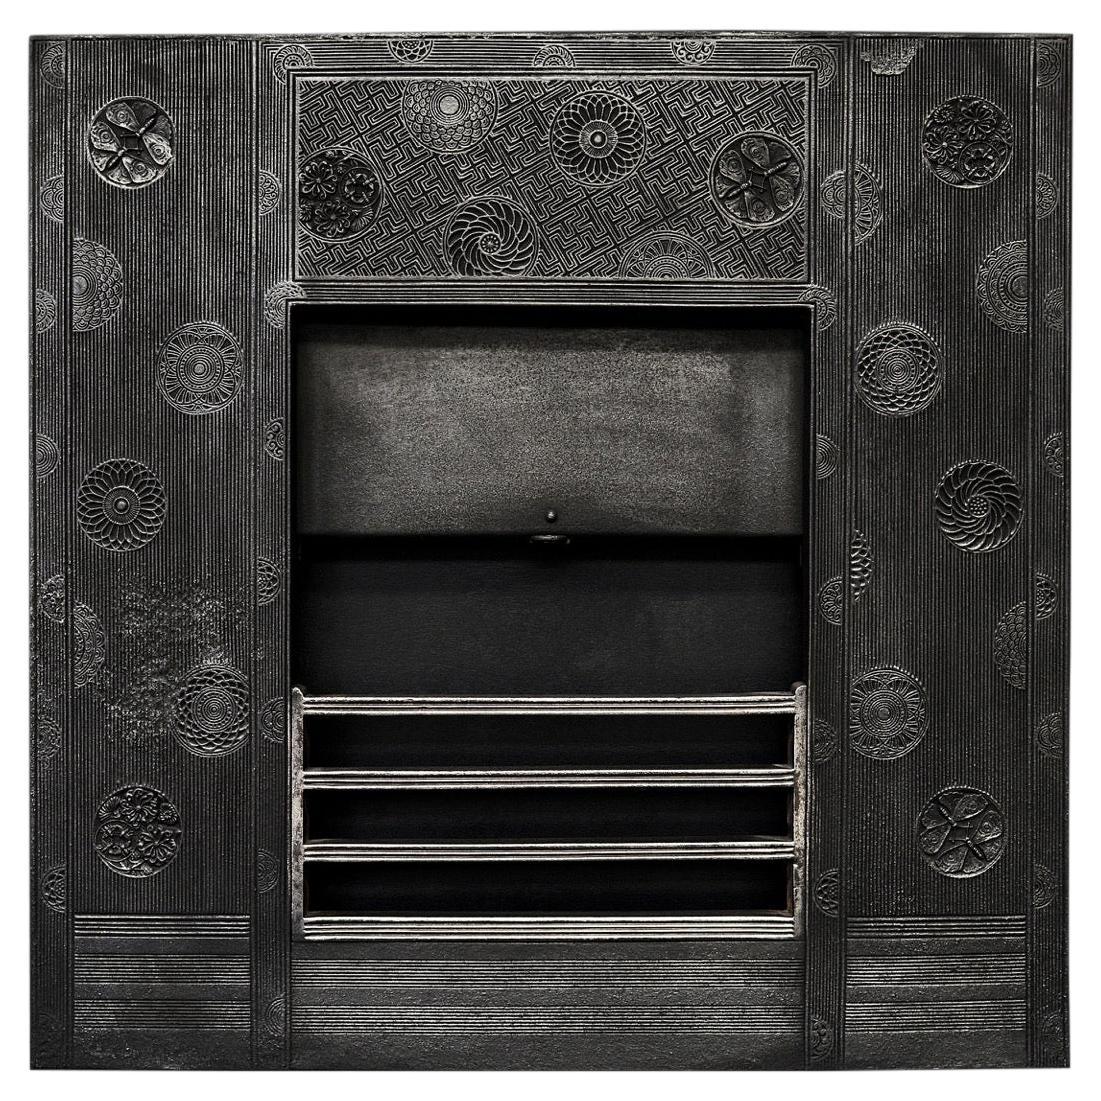 Unusual Cast Iron Insert by Thomas Jeckyll